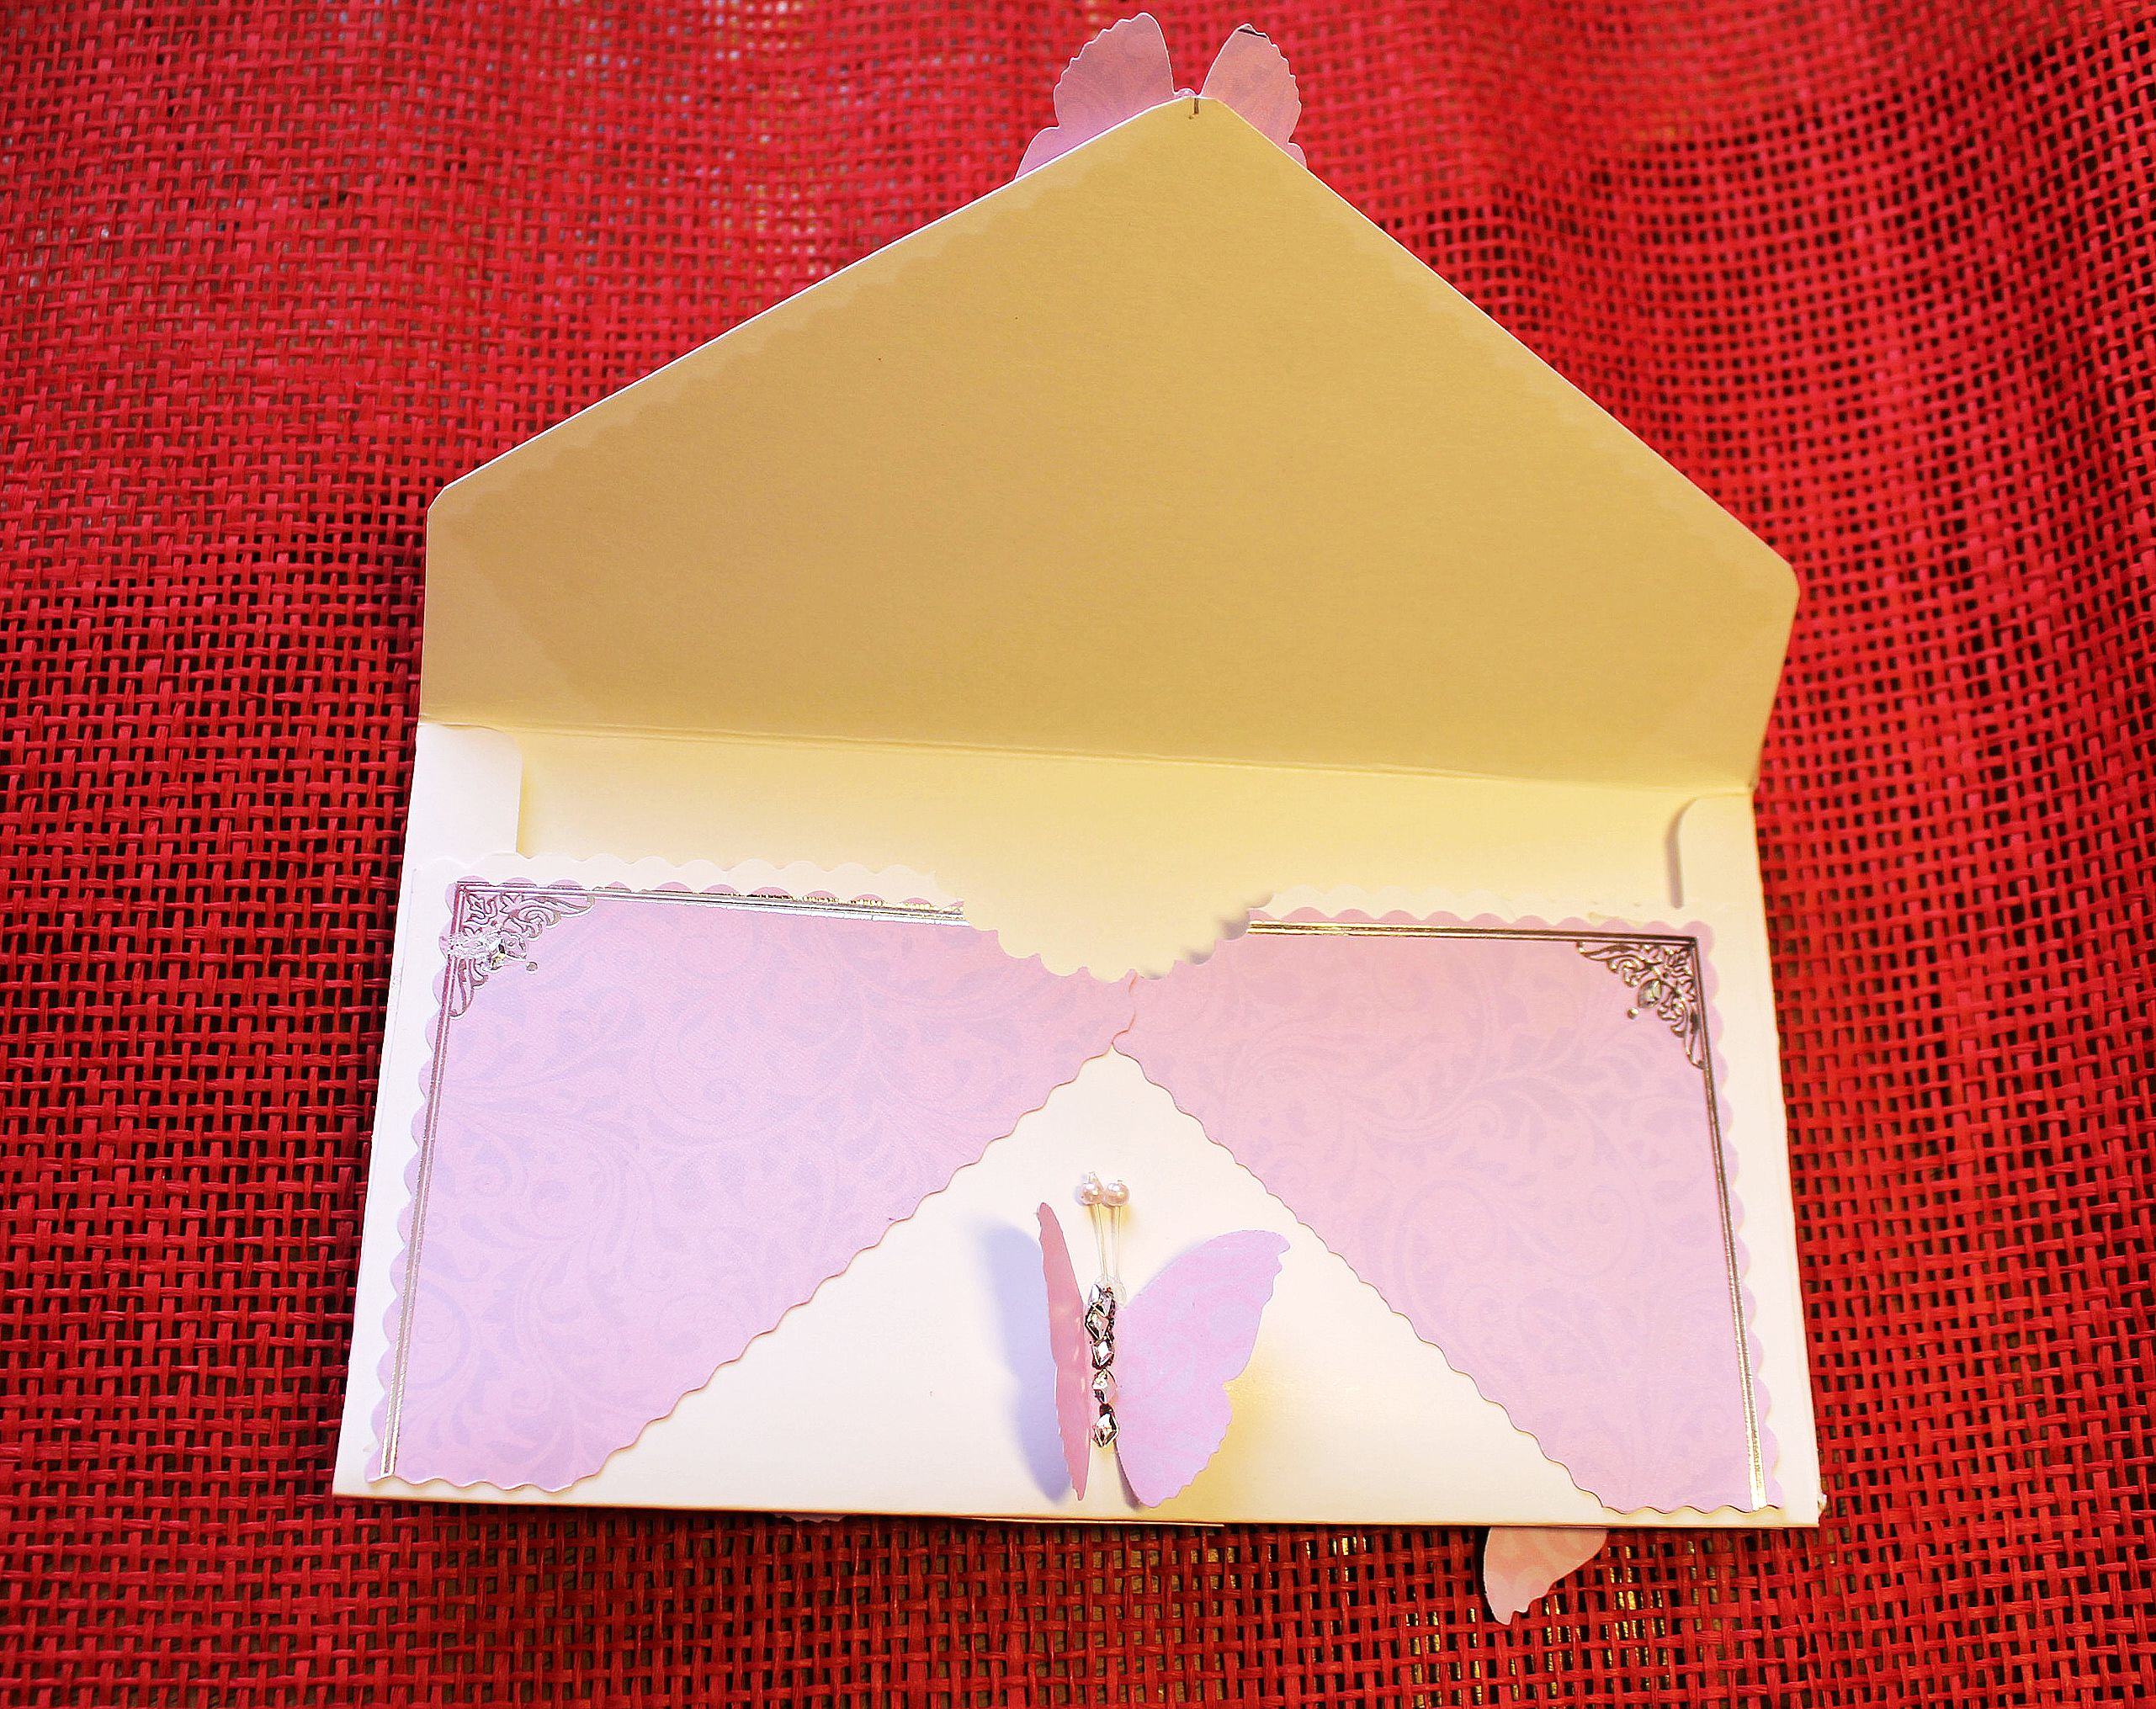 Задача открытка и конверт, гвозди картинки